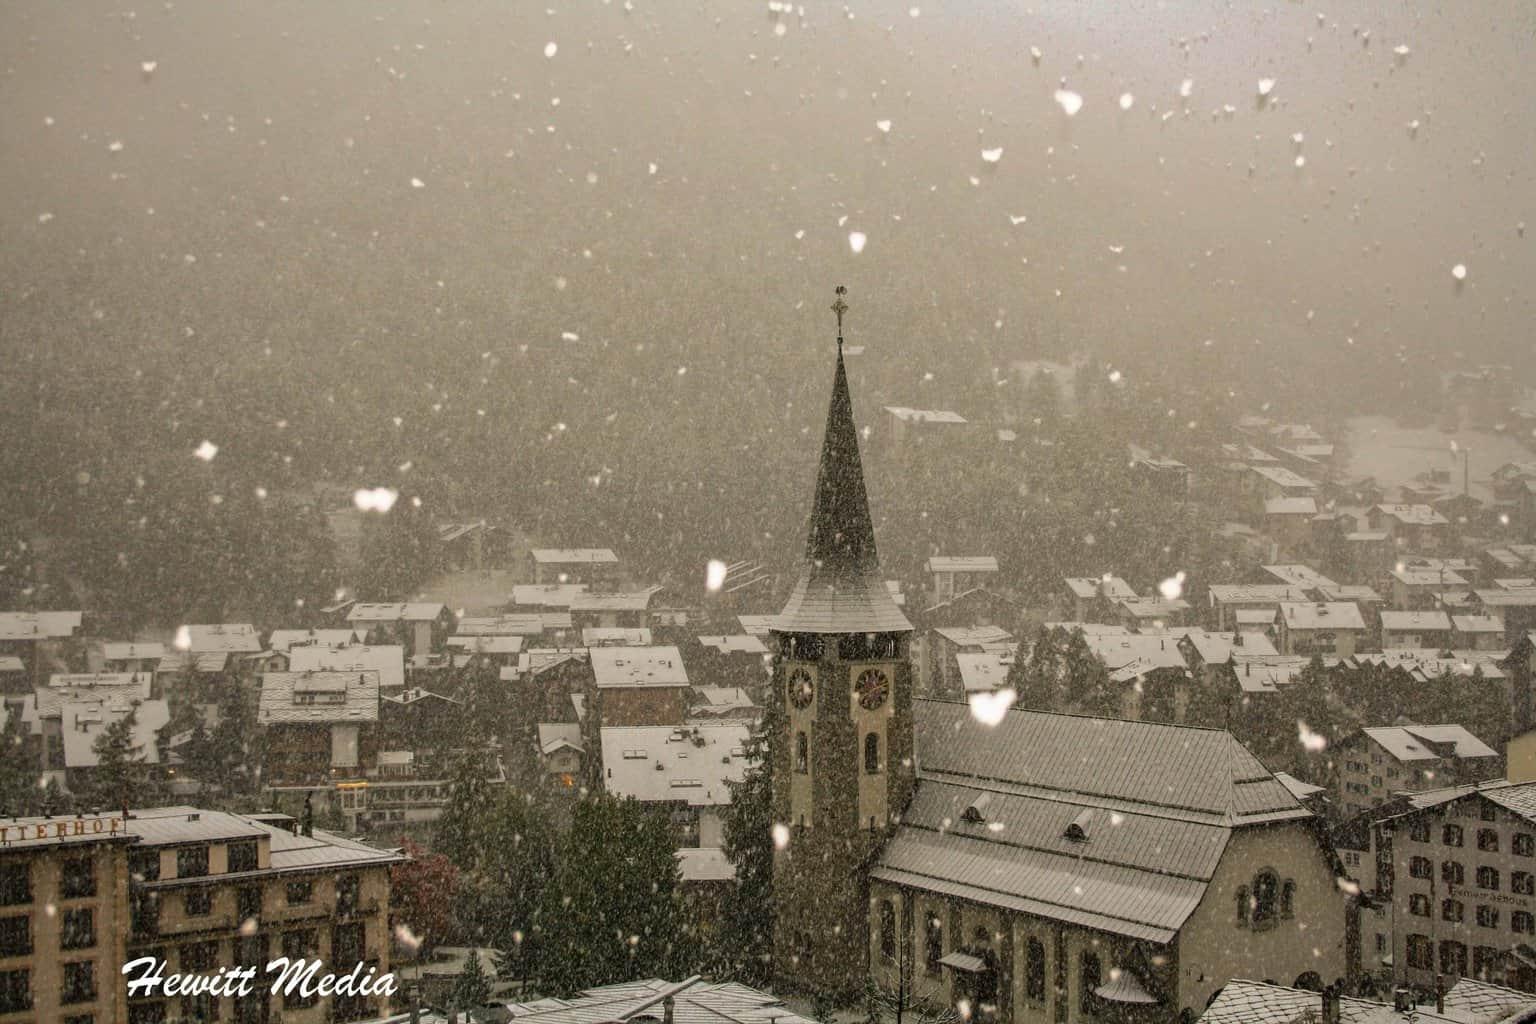 Zermatt during snow fall